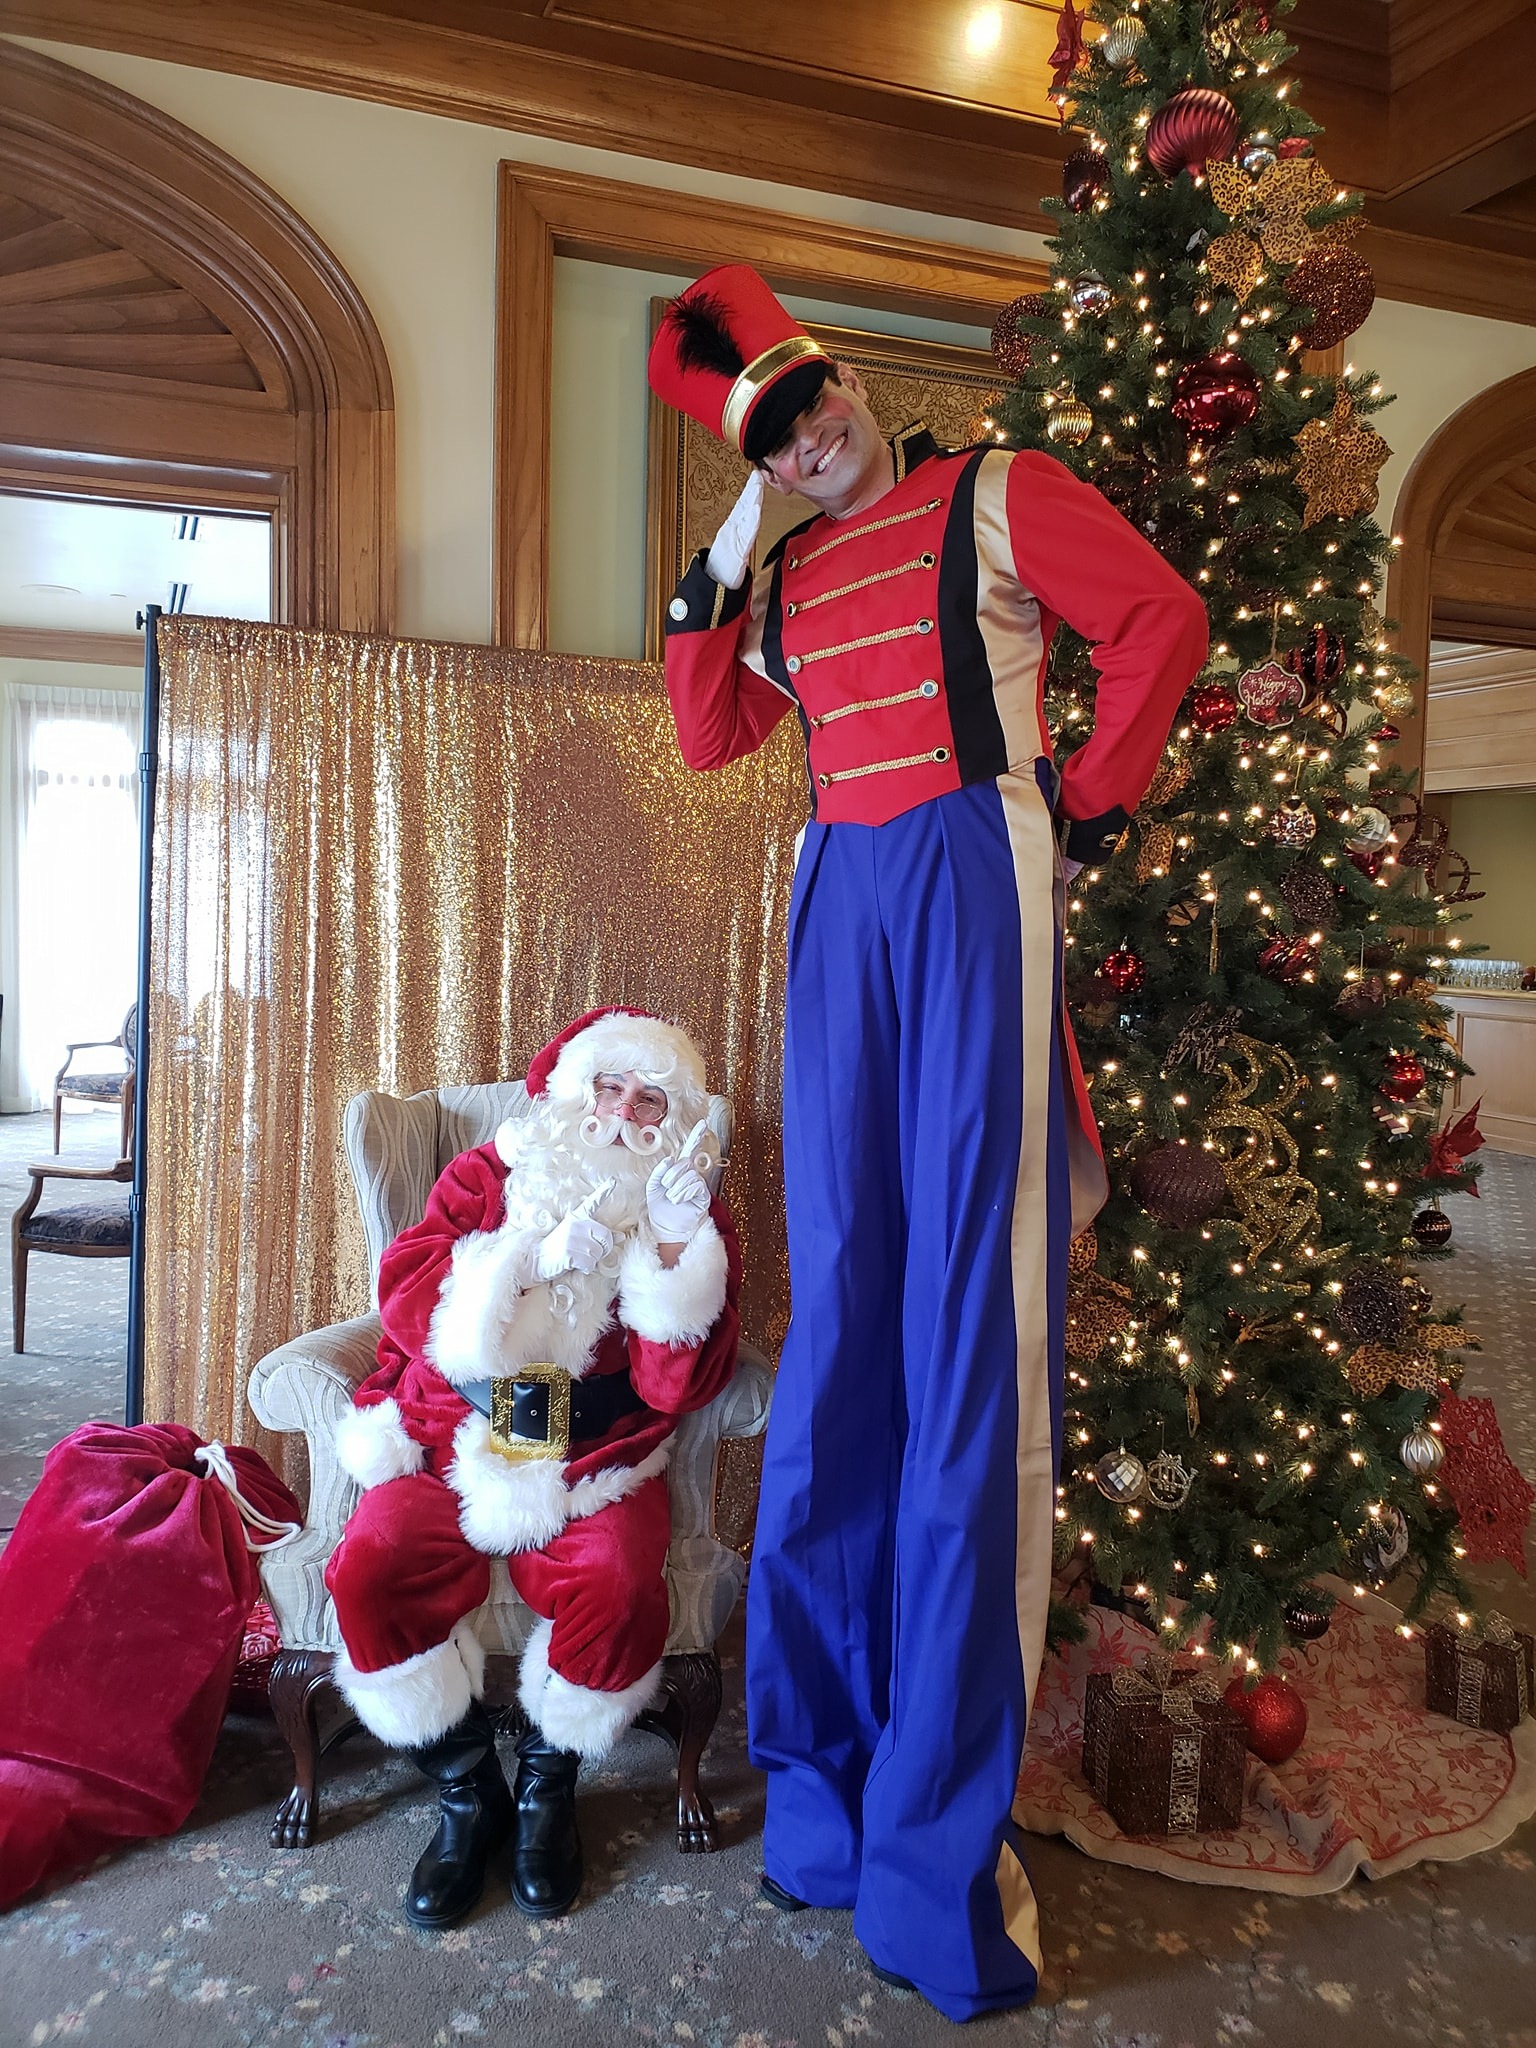 Toy Soldier & Santa